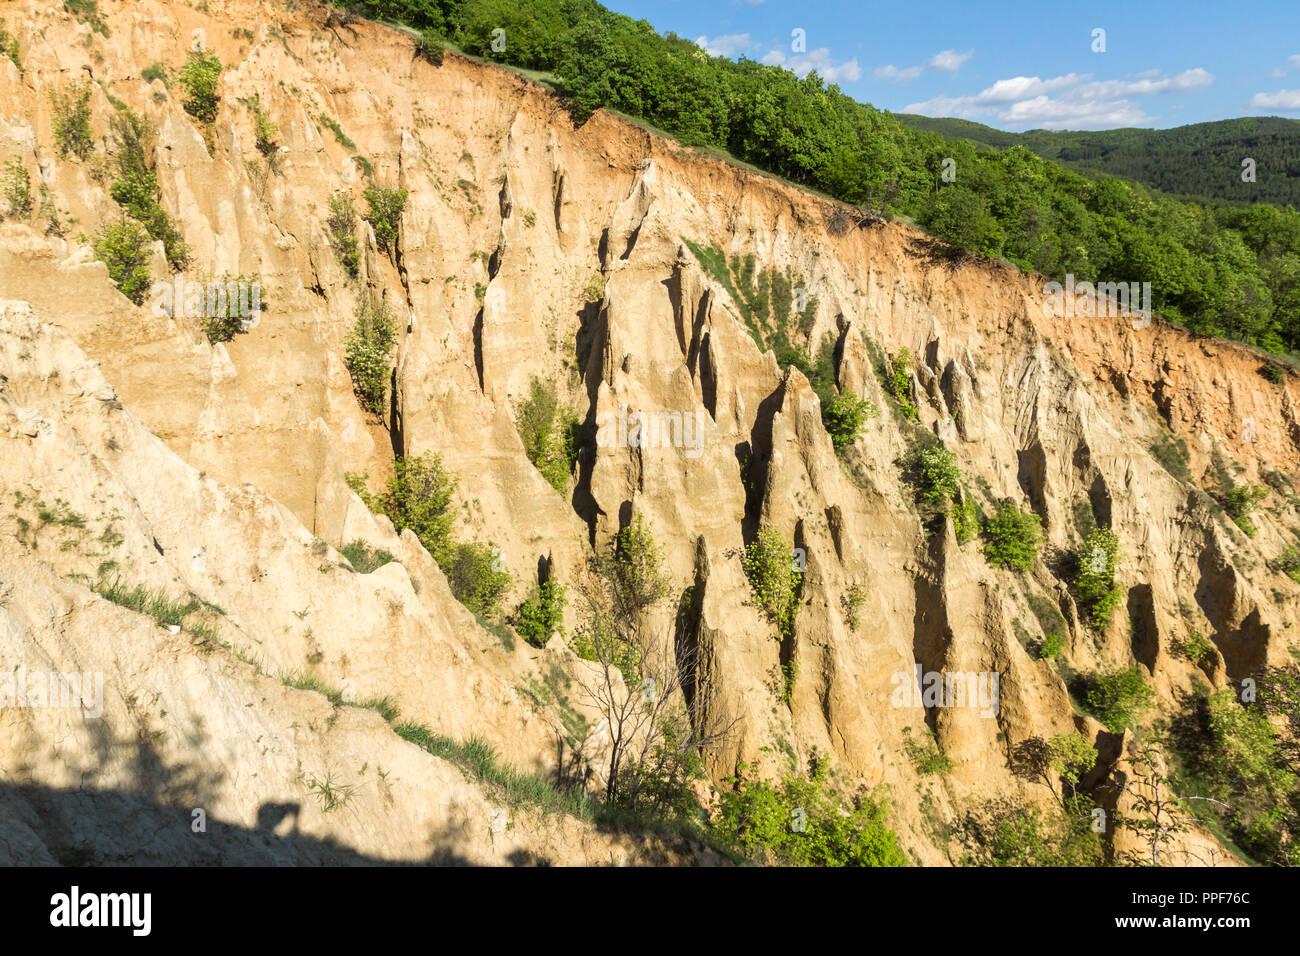 Landscape with rock formation Stob pyramids, Rila Mountain, Kyustendil region, Bulgaria - Stock Image